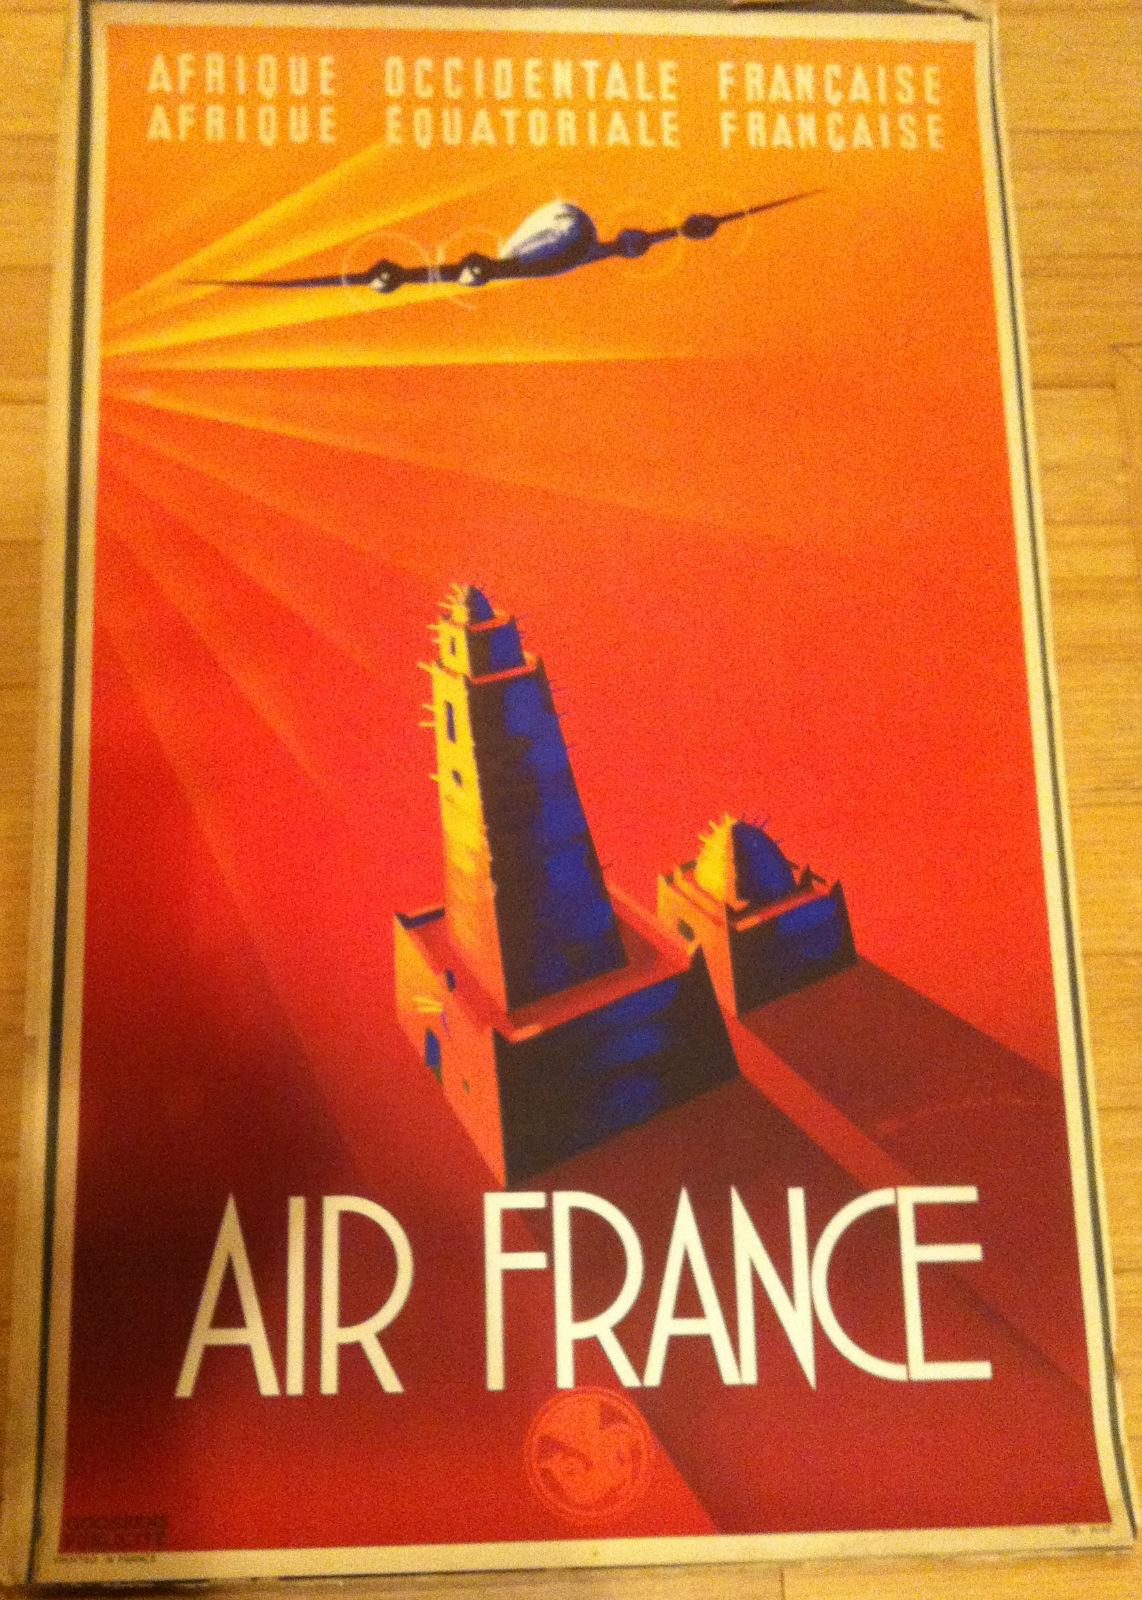 Original Air France Poster circa 1930s